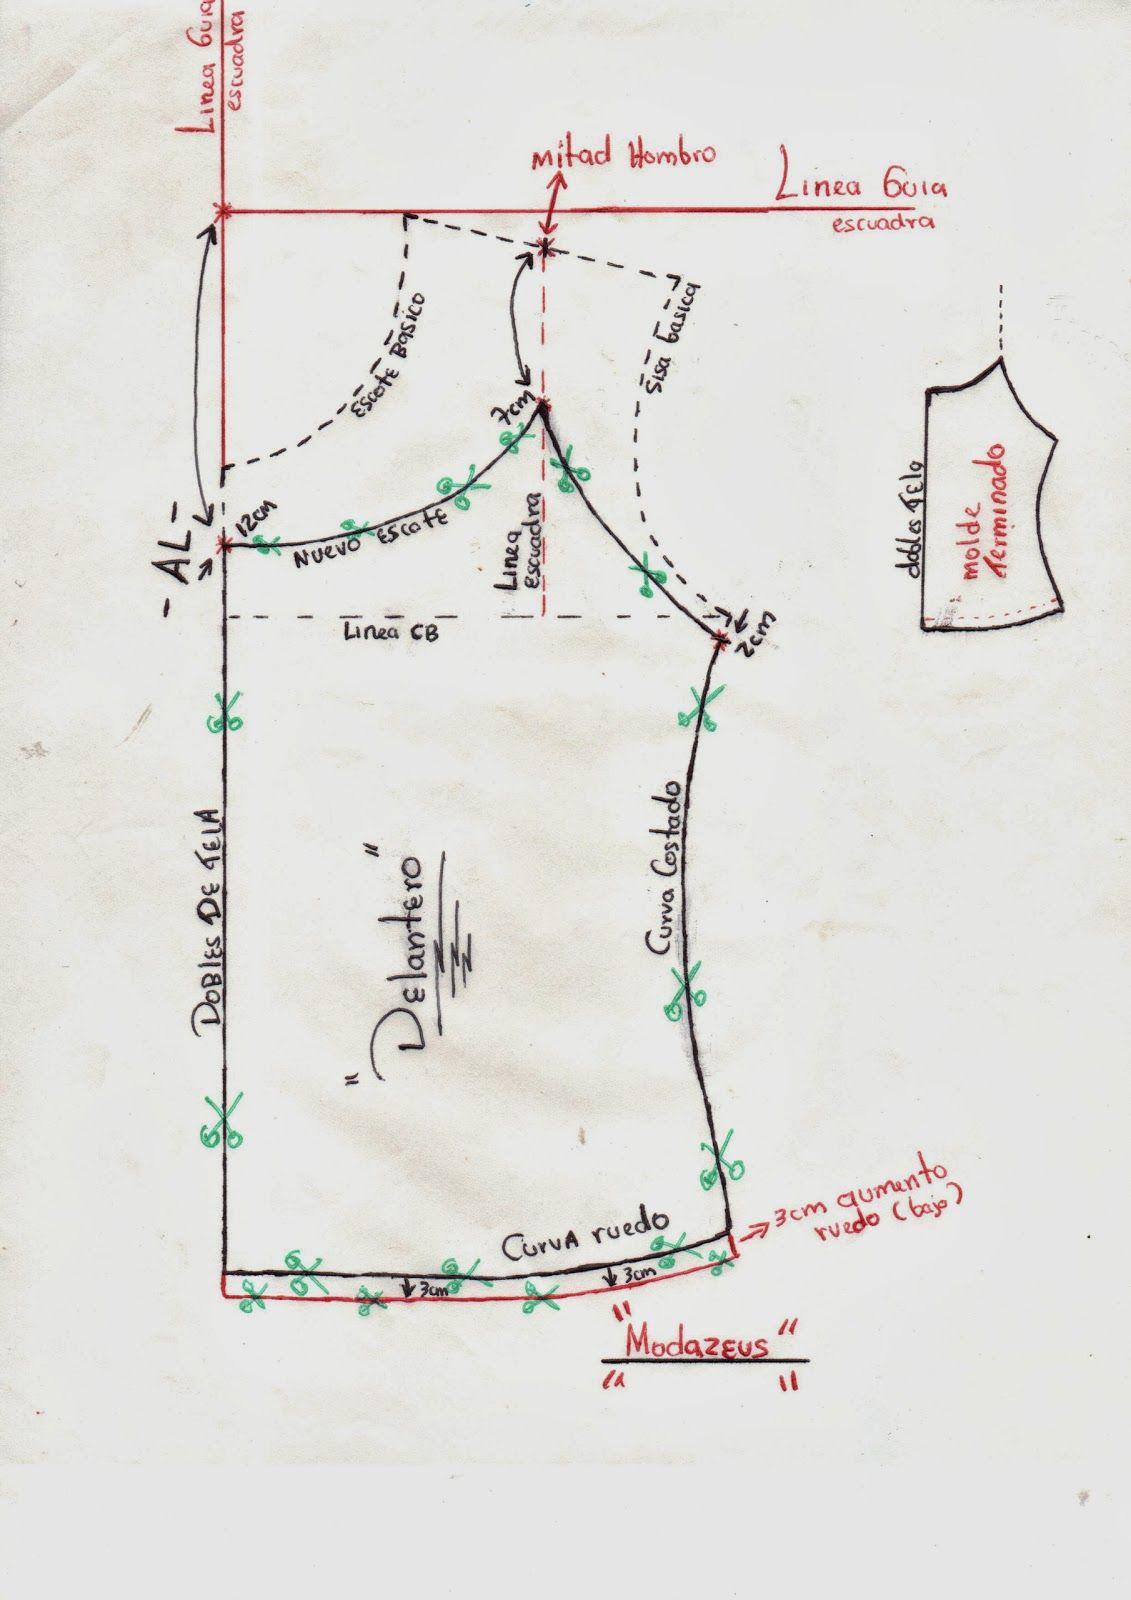 Pin de Martha Abalco en sosten | Costura, Blusas y Moldes